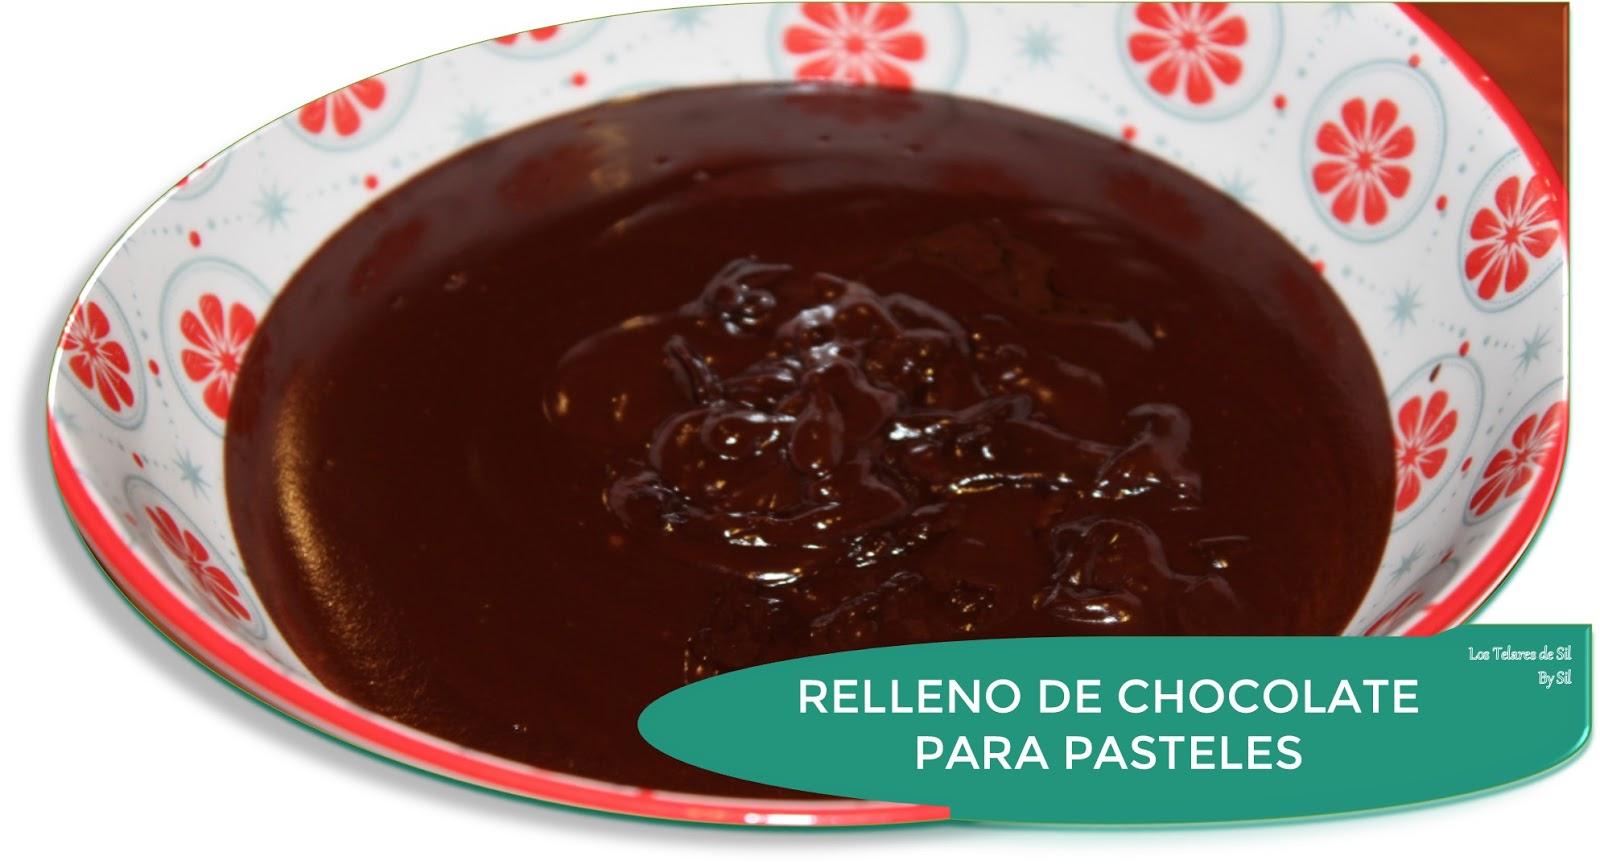 RELLENO DE CHOCOLATE PARA PASTELES